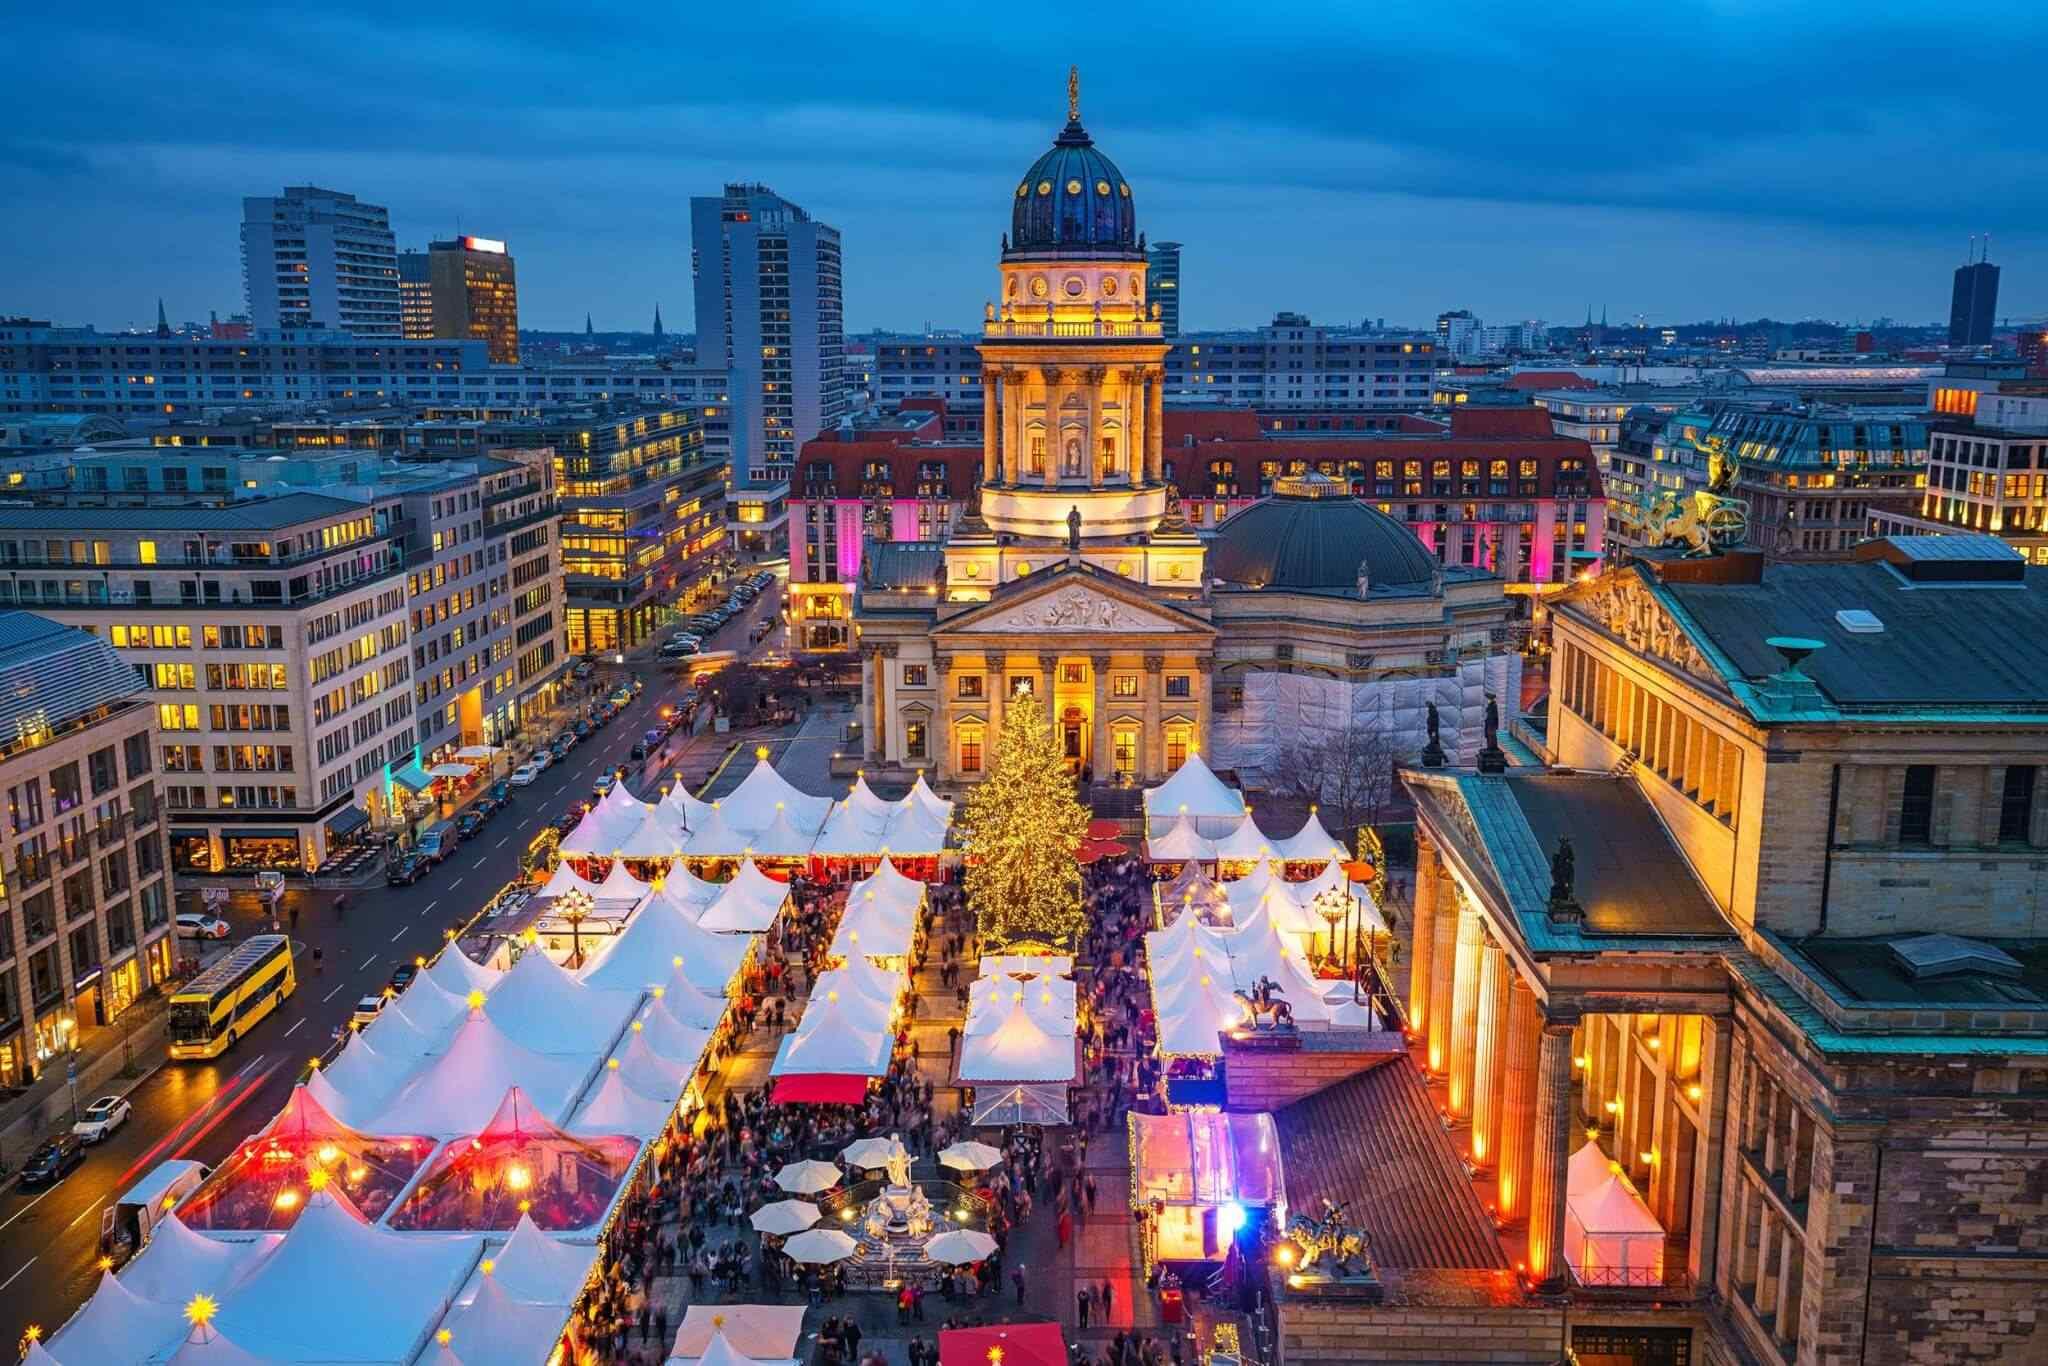 https://www.flightspro.co.uk/wp-content/uploads/2018/09/destination-berlin-07.jpg